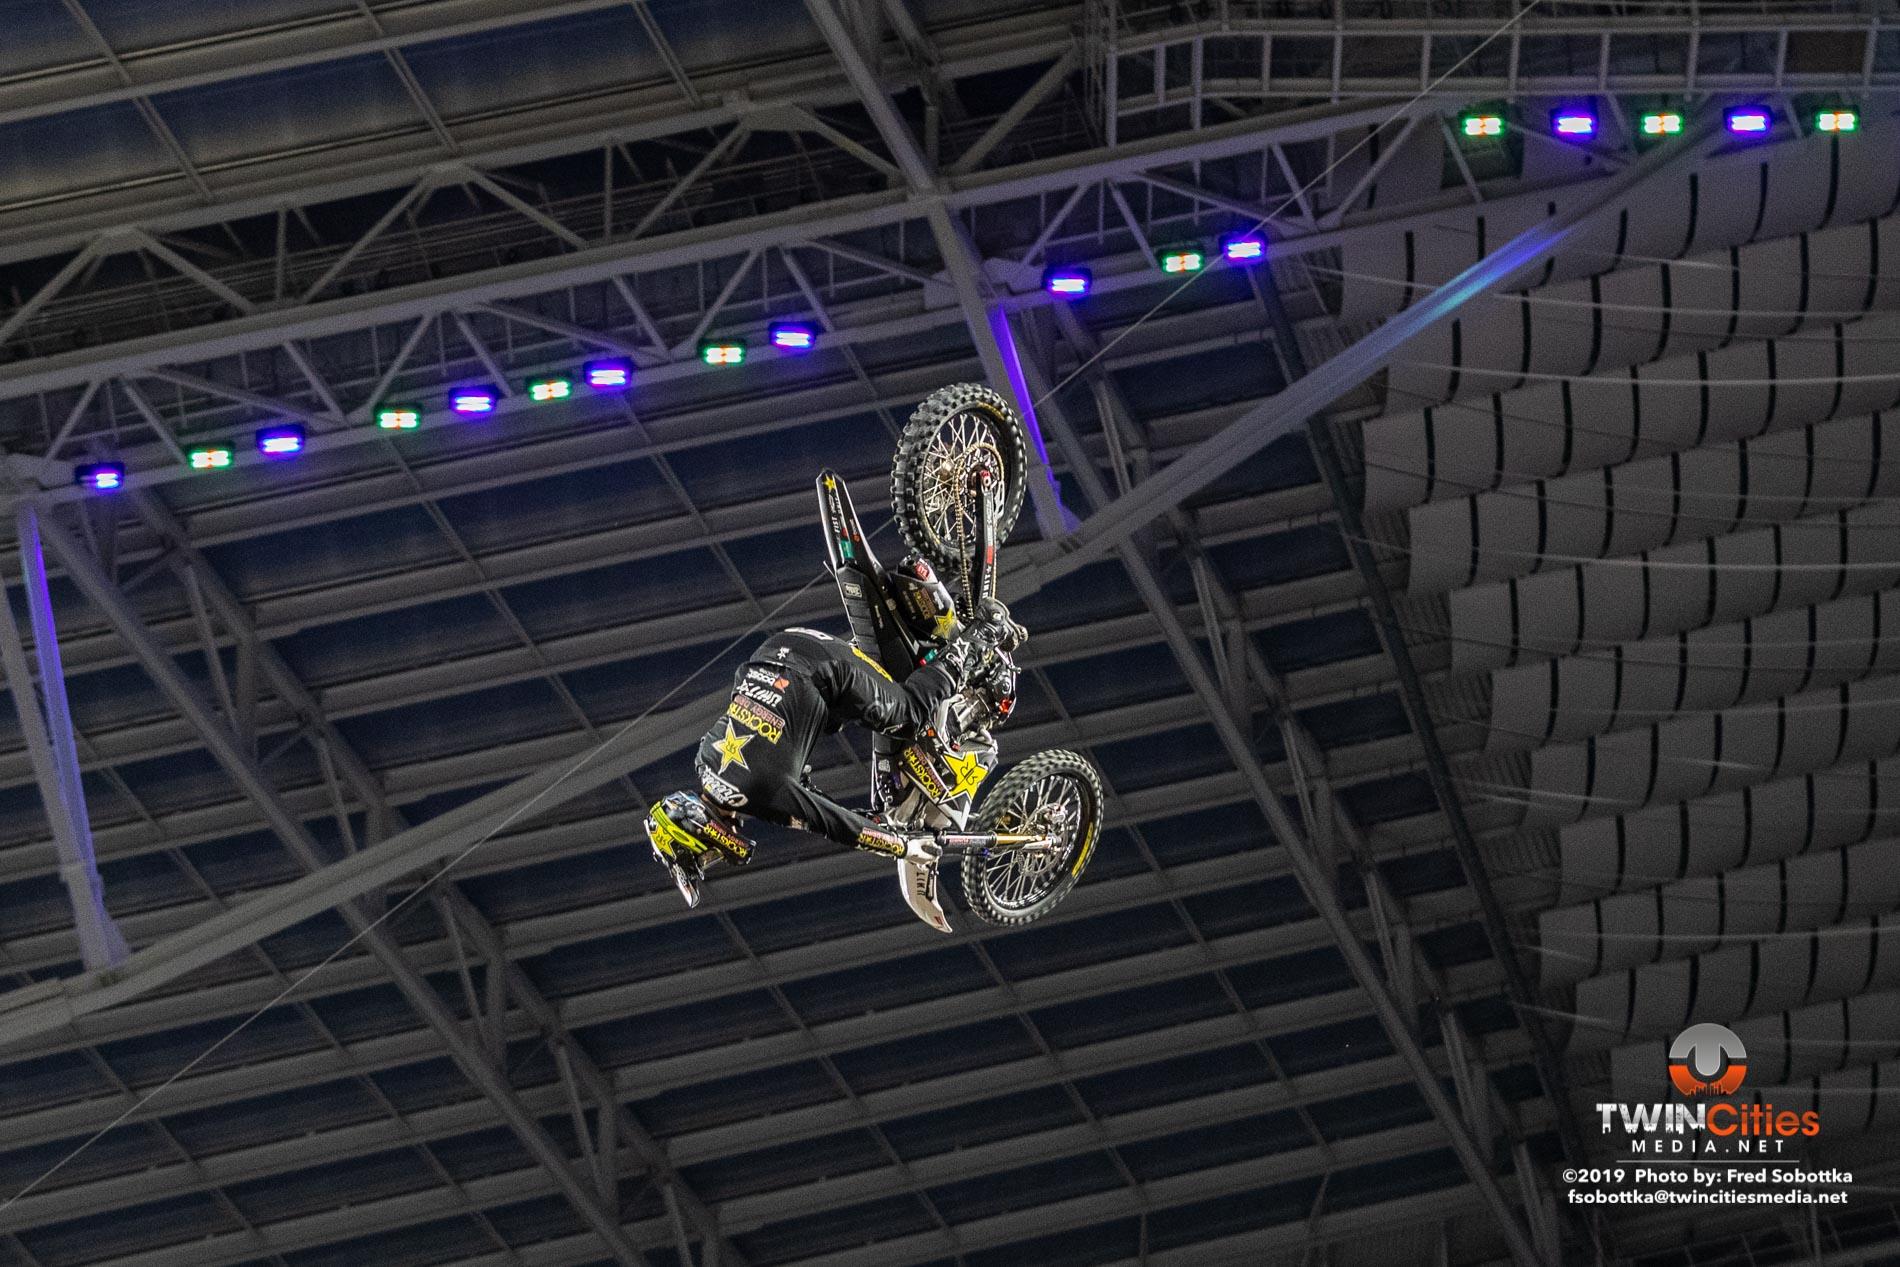 Moto-X-Quarterpipe-High-Air-05